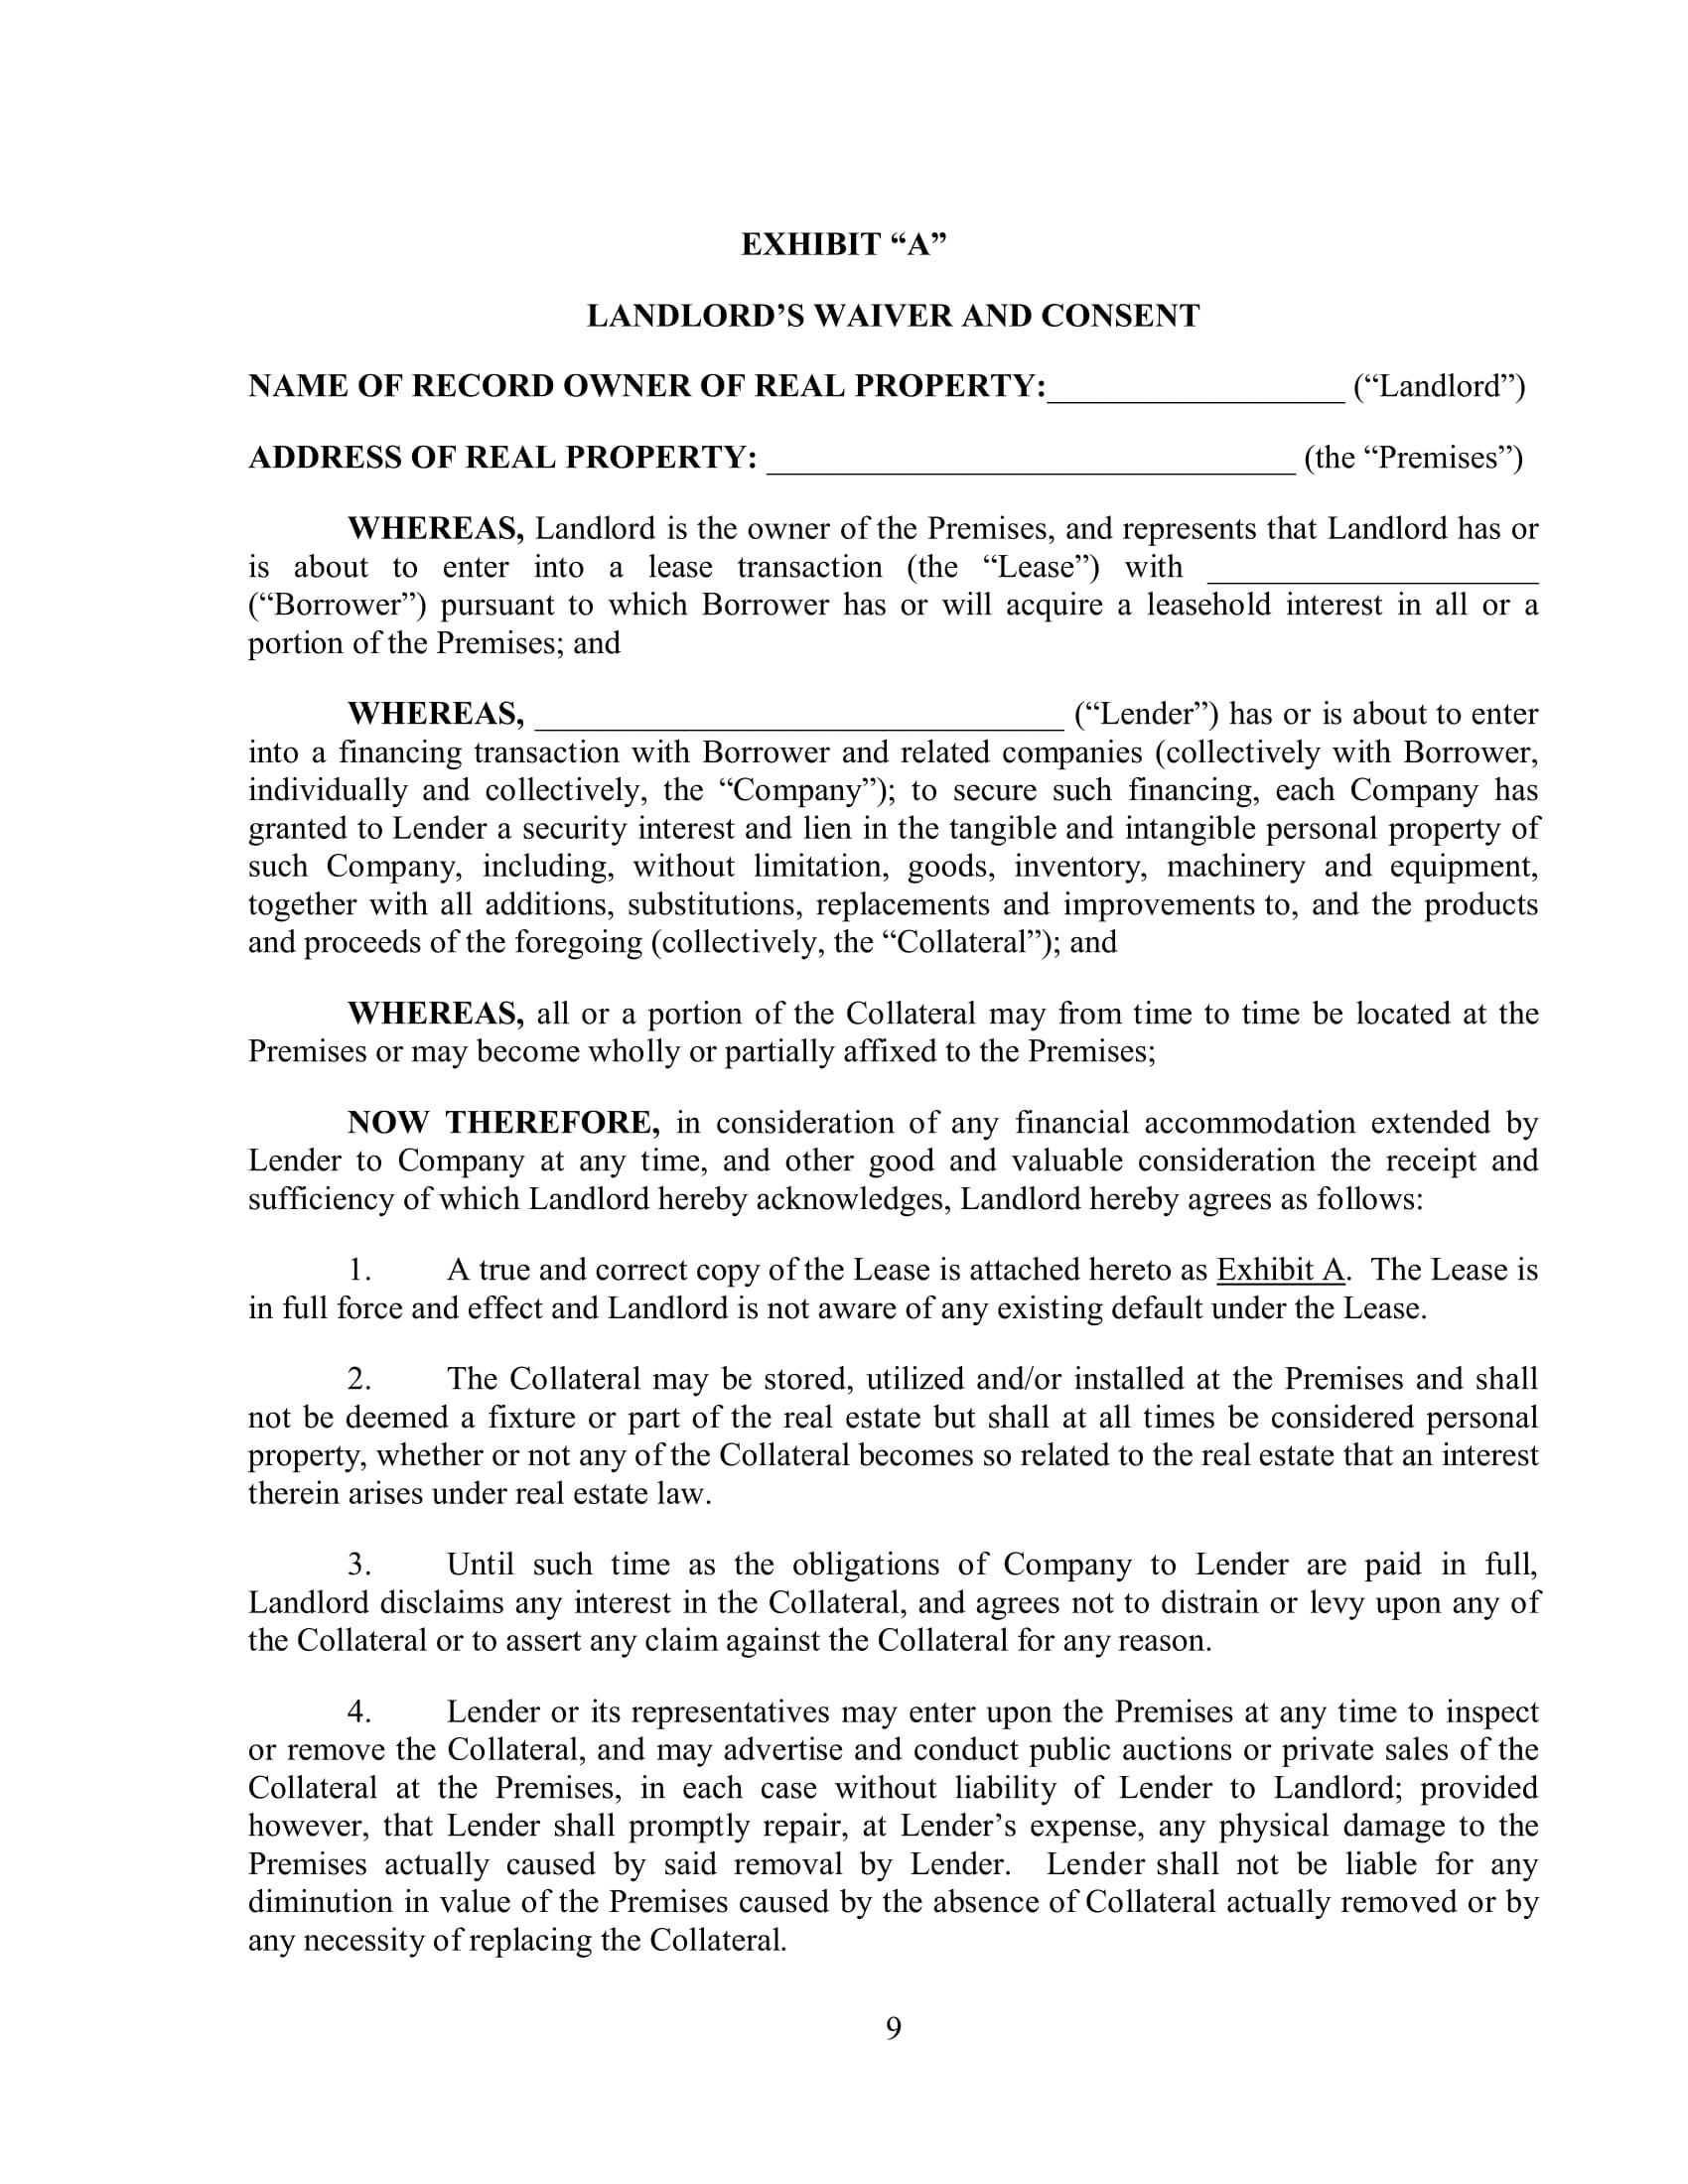 Sample Subordination Agreement Template 24 Subordination Agreement Forms  PDF DOC 17